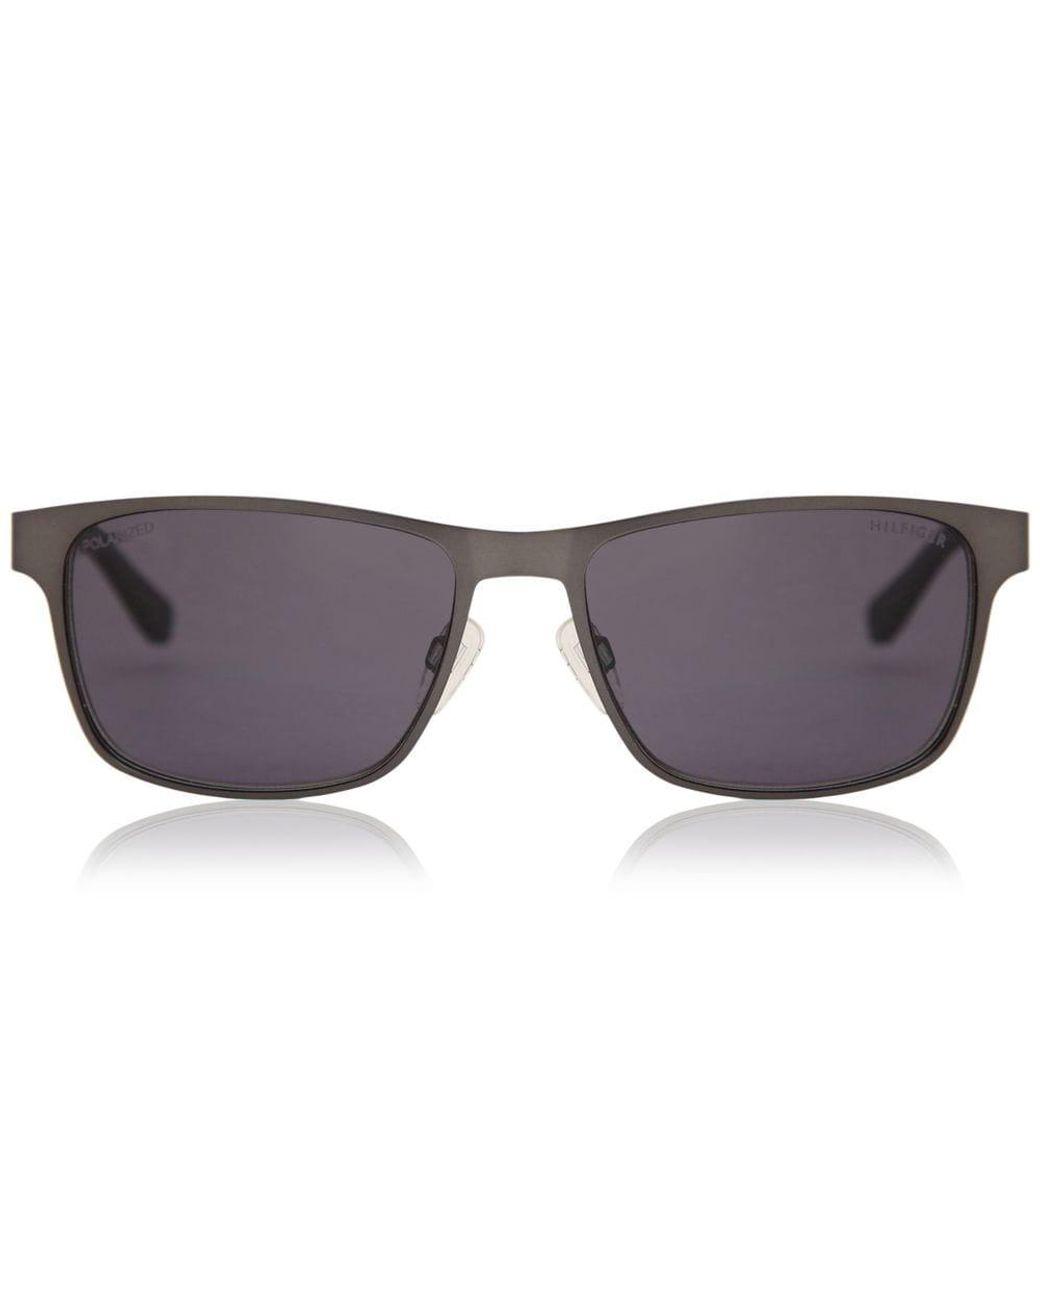 Tommy Hilfiger Sunglasses TH 1283//S FO5 3H Ruthenium White Grey Polarized